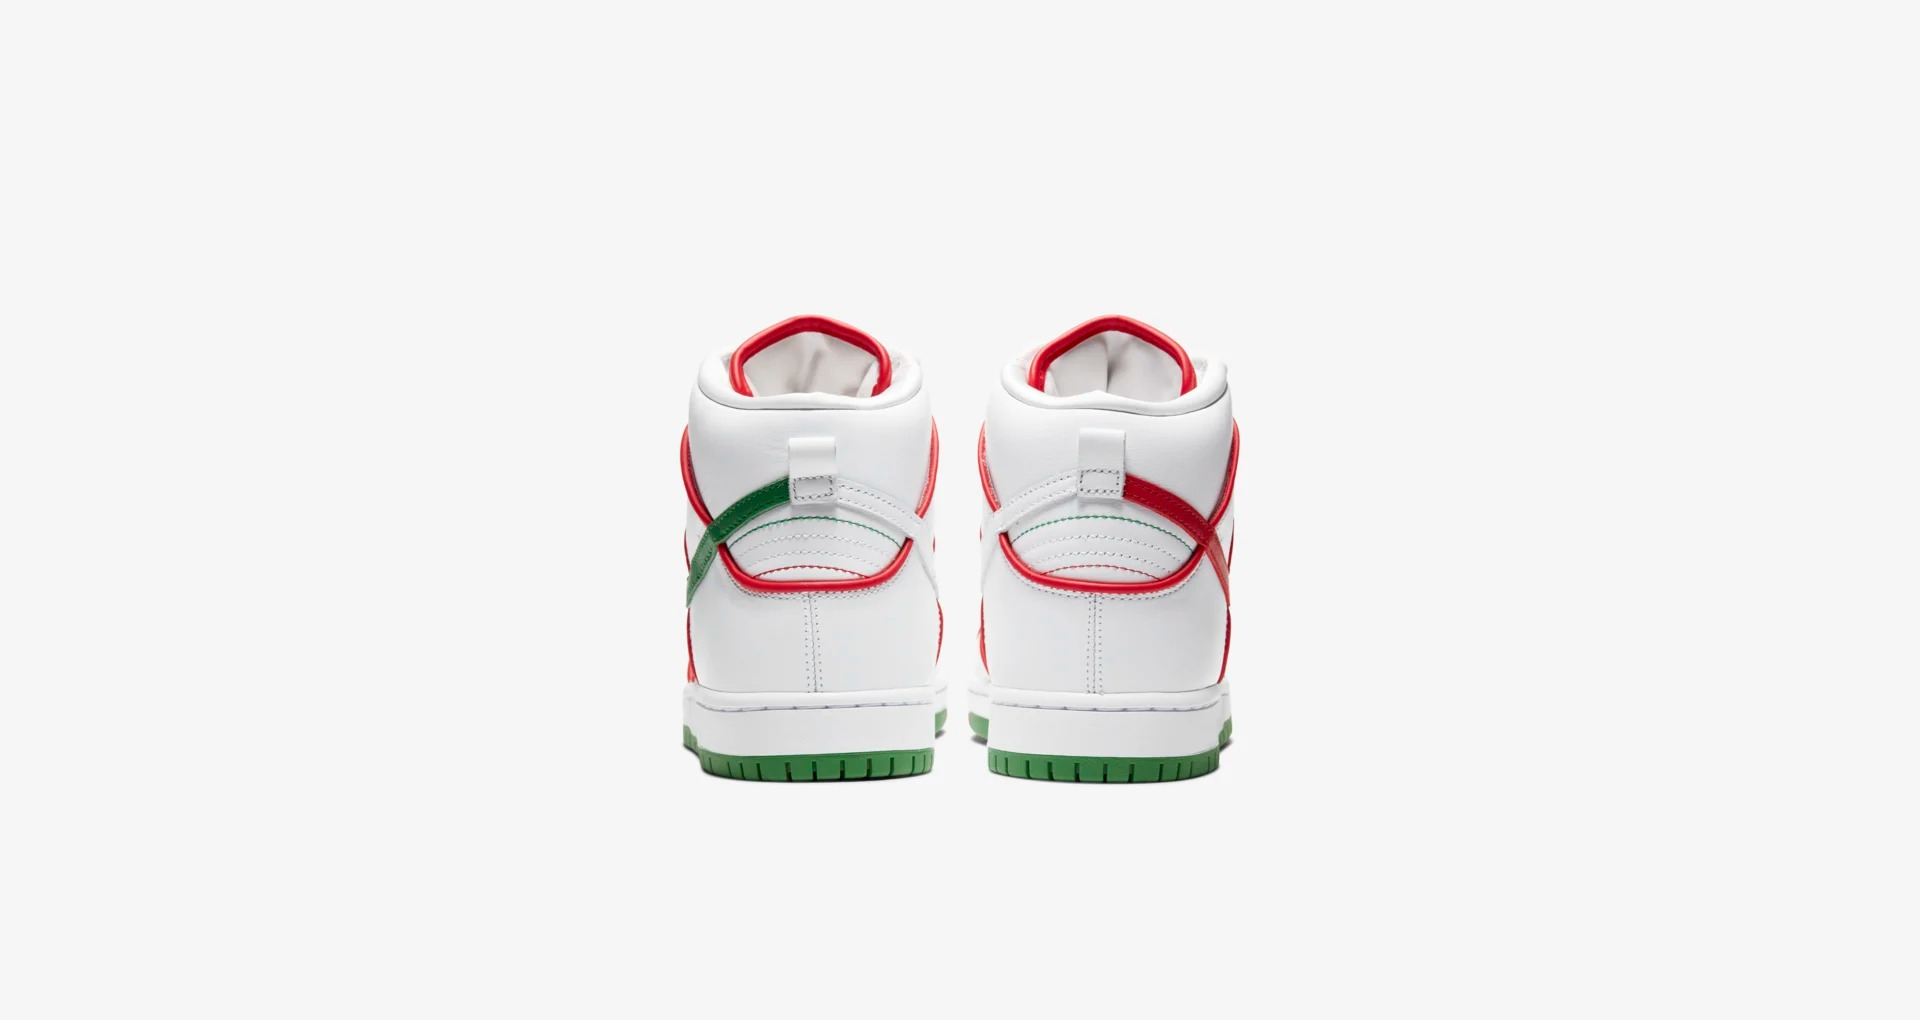 adidas,Nike,发售,Superstar,Dunk, 明日抢鞋指南!万寿无疆 AM1!丝绸 AJ1!金腰带 Dunk!